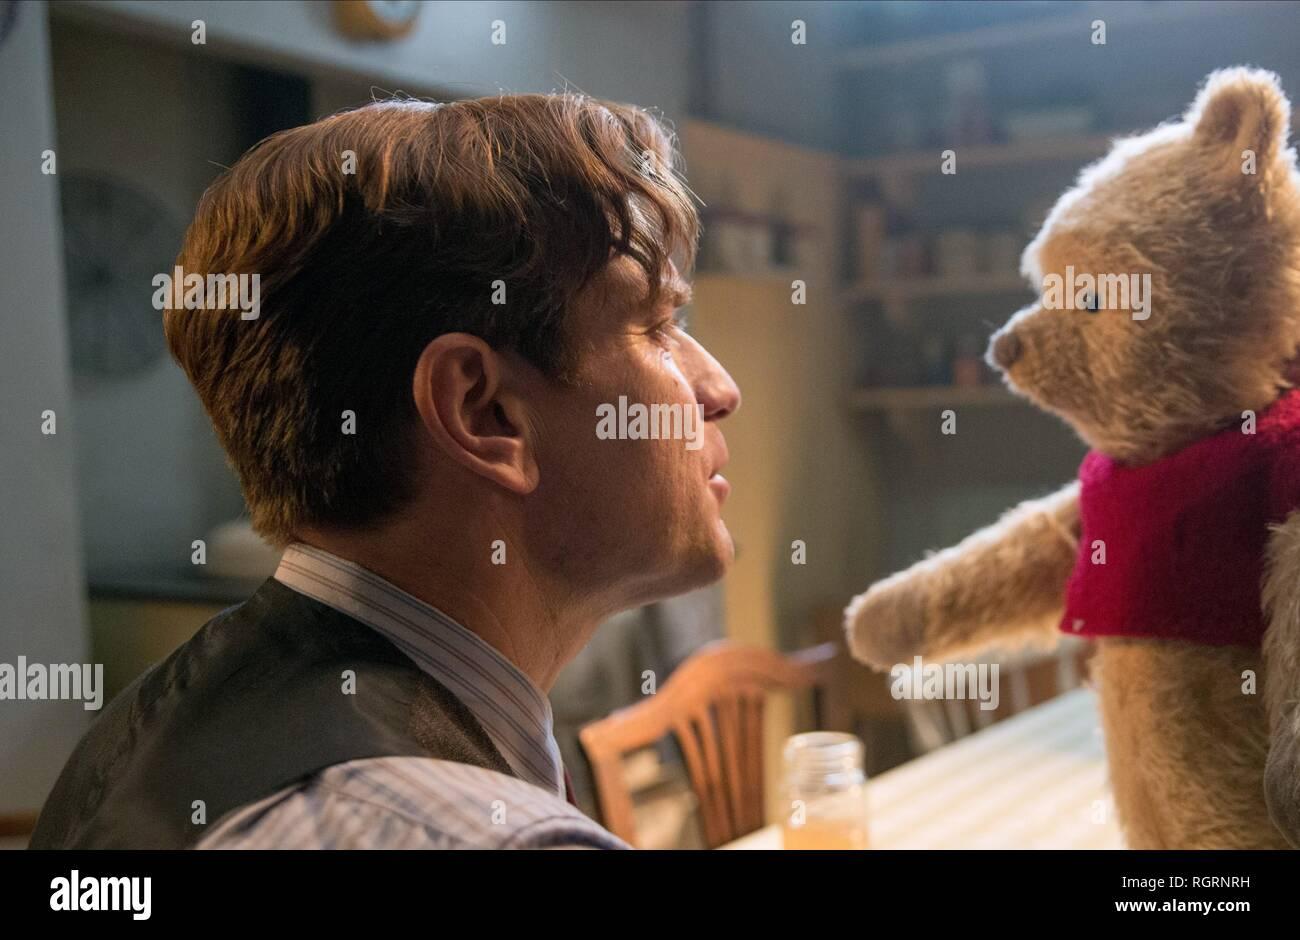 Ewan Mcgregor Winnie The Pooh Christopher Robin 2018 Stock Photo Alamy